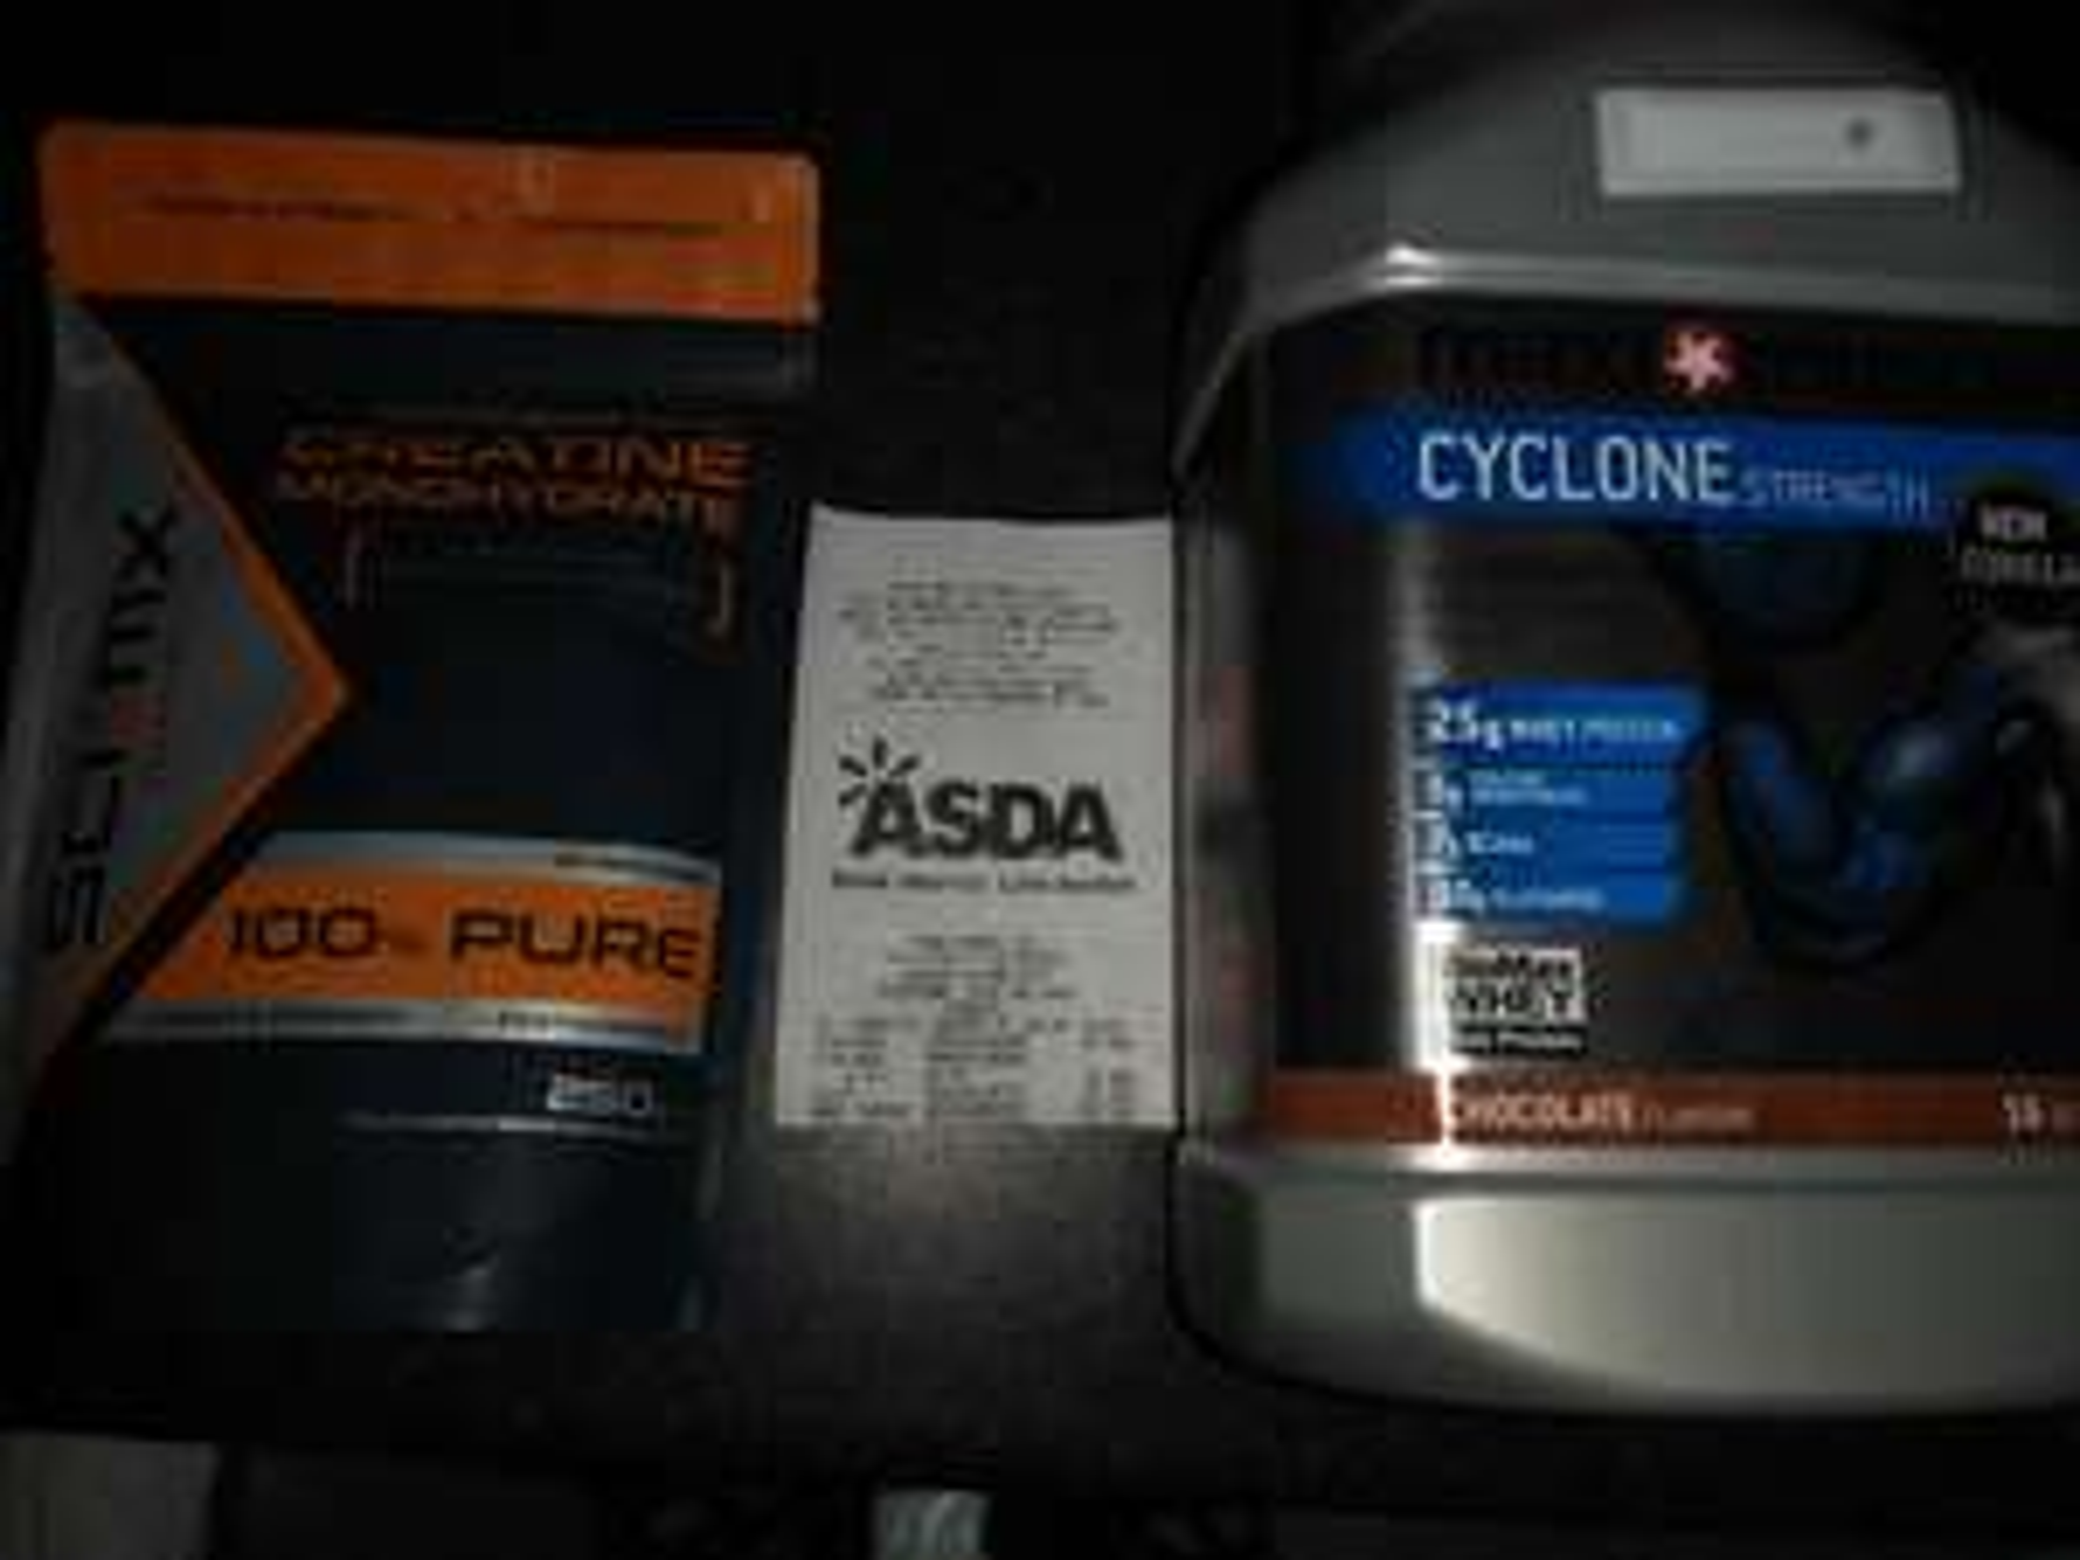 maxi muscle cyclone 980g £10. SCI-MX creatine 250g £3 IN-STORE ASDA